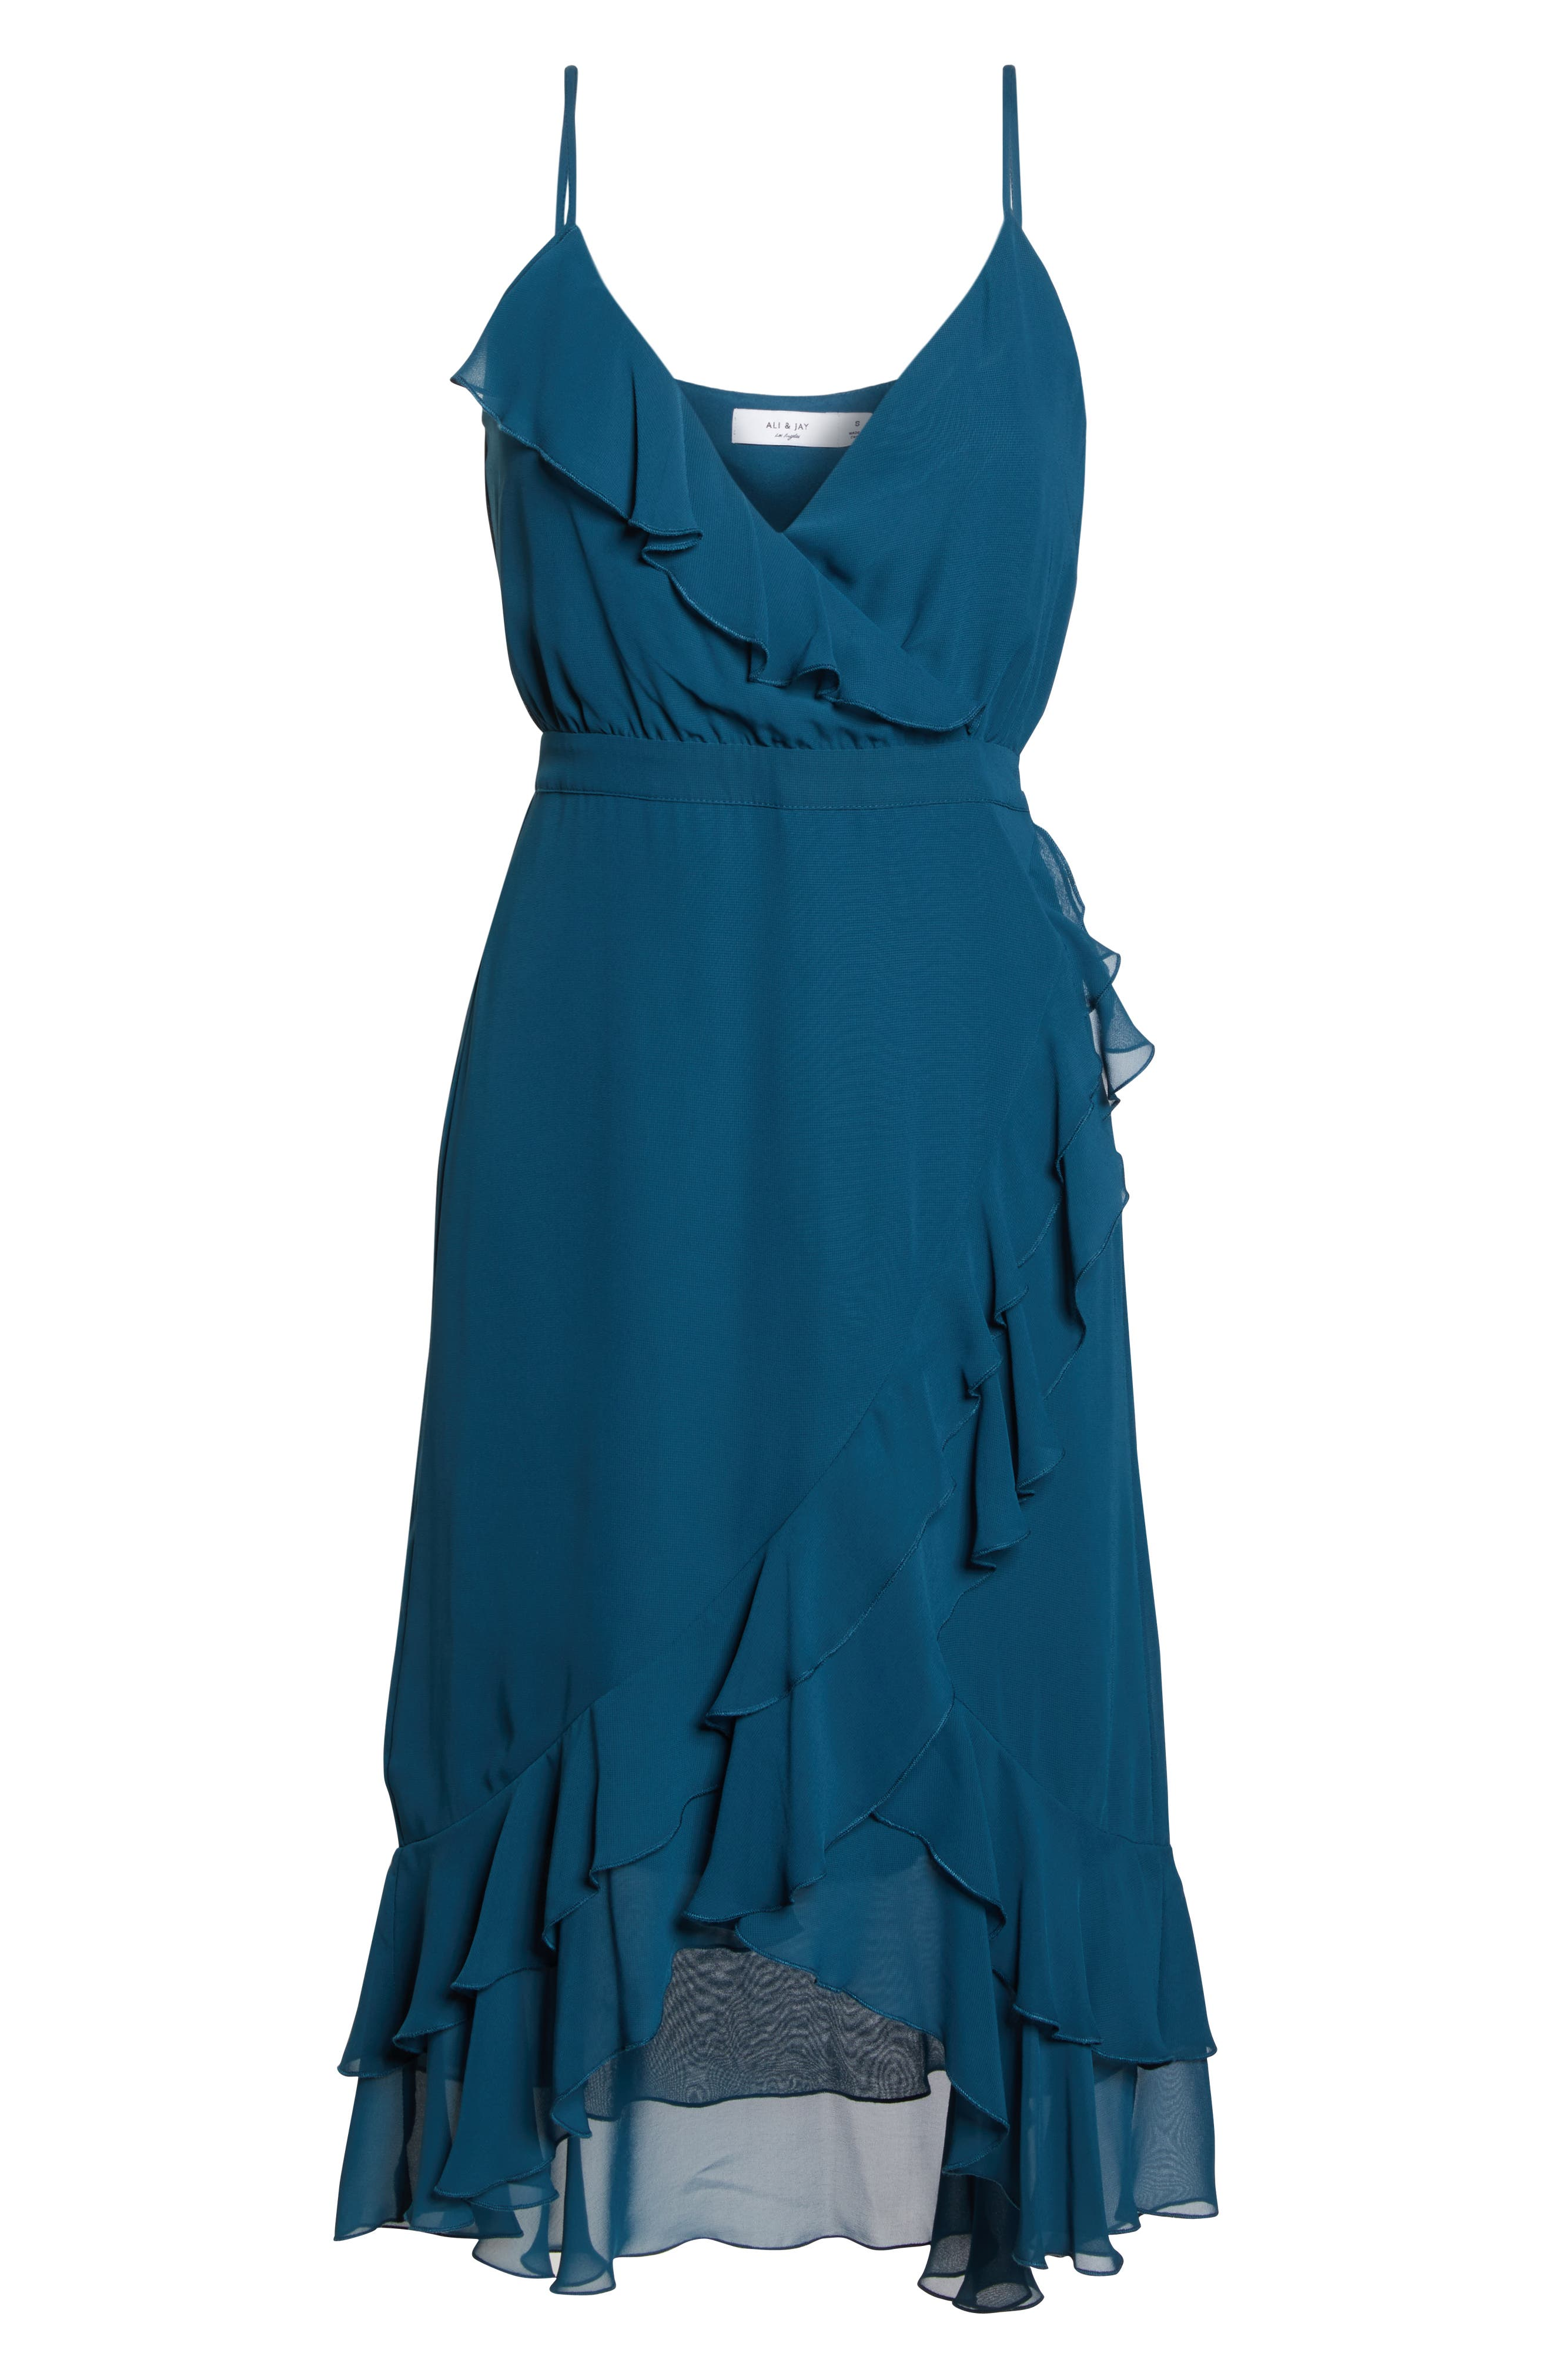 ALI & JAY, Pretty Lady High/Low Dress, Alternate thumbnail 7, color, 400